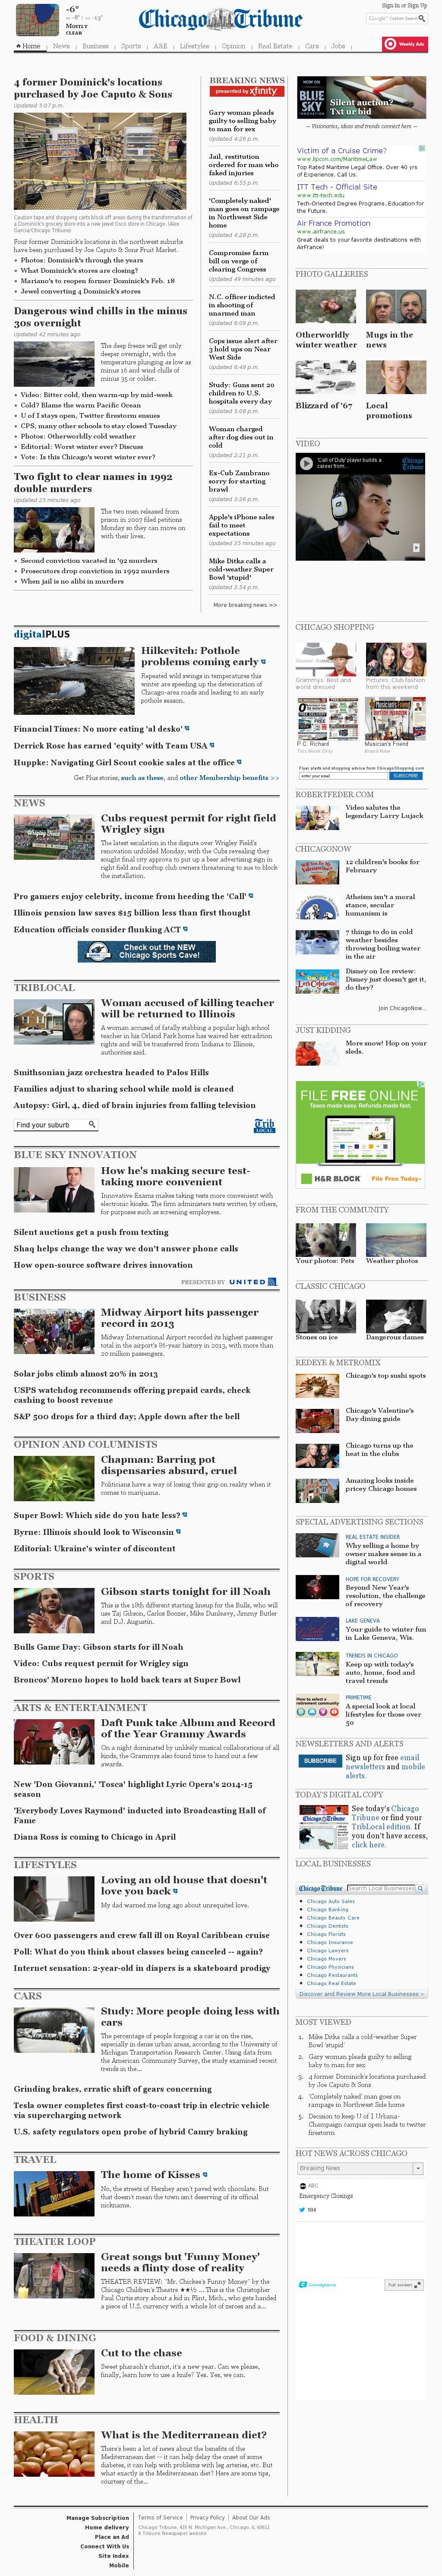 Chicago Tribune at Tuesday Jan. 28, 2014, 2:02 a.m. UTC